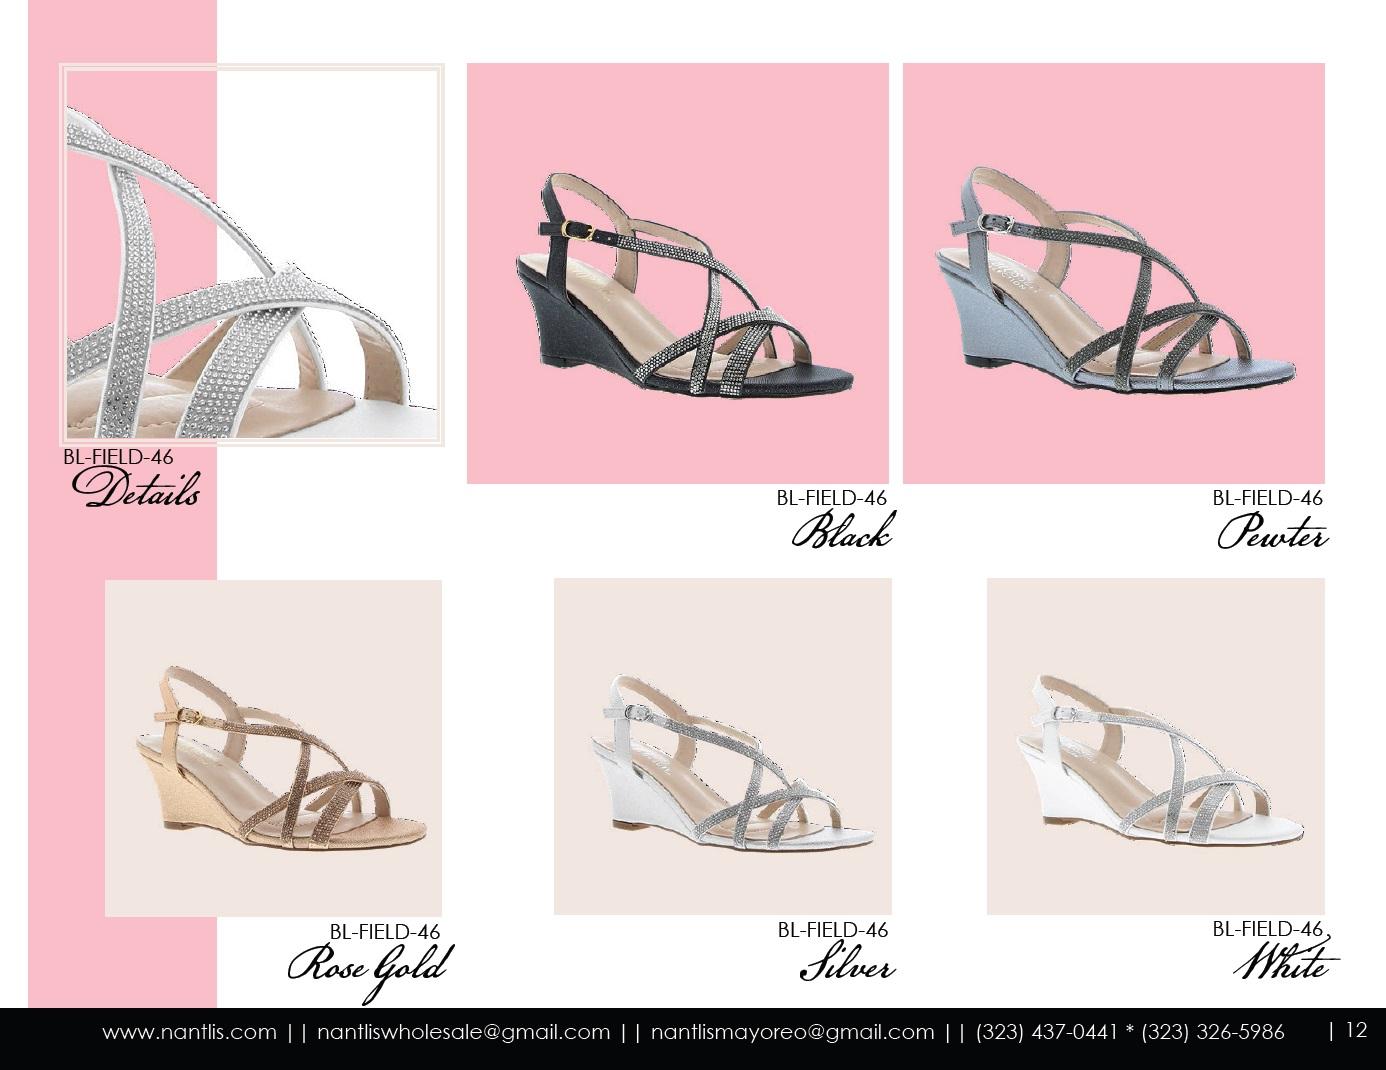 Nantlis Vol BL50 Zapatos de Mujer mayoreo Catalogo Wholesale womens Shoes_Page_12